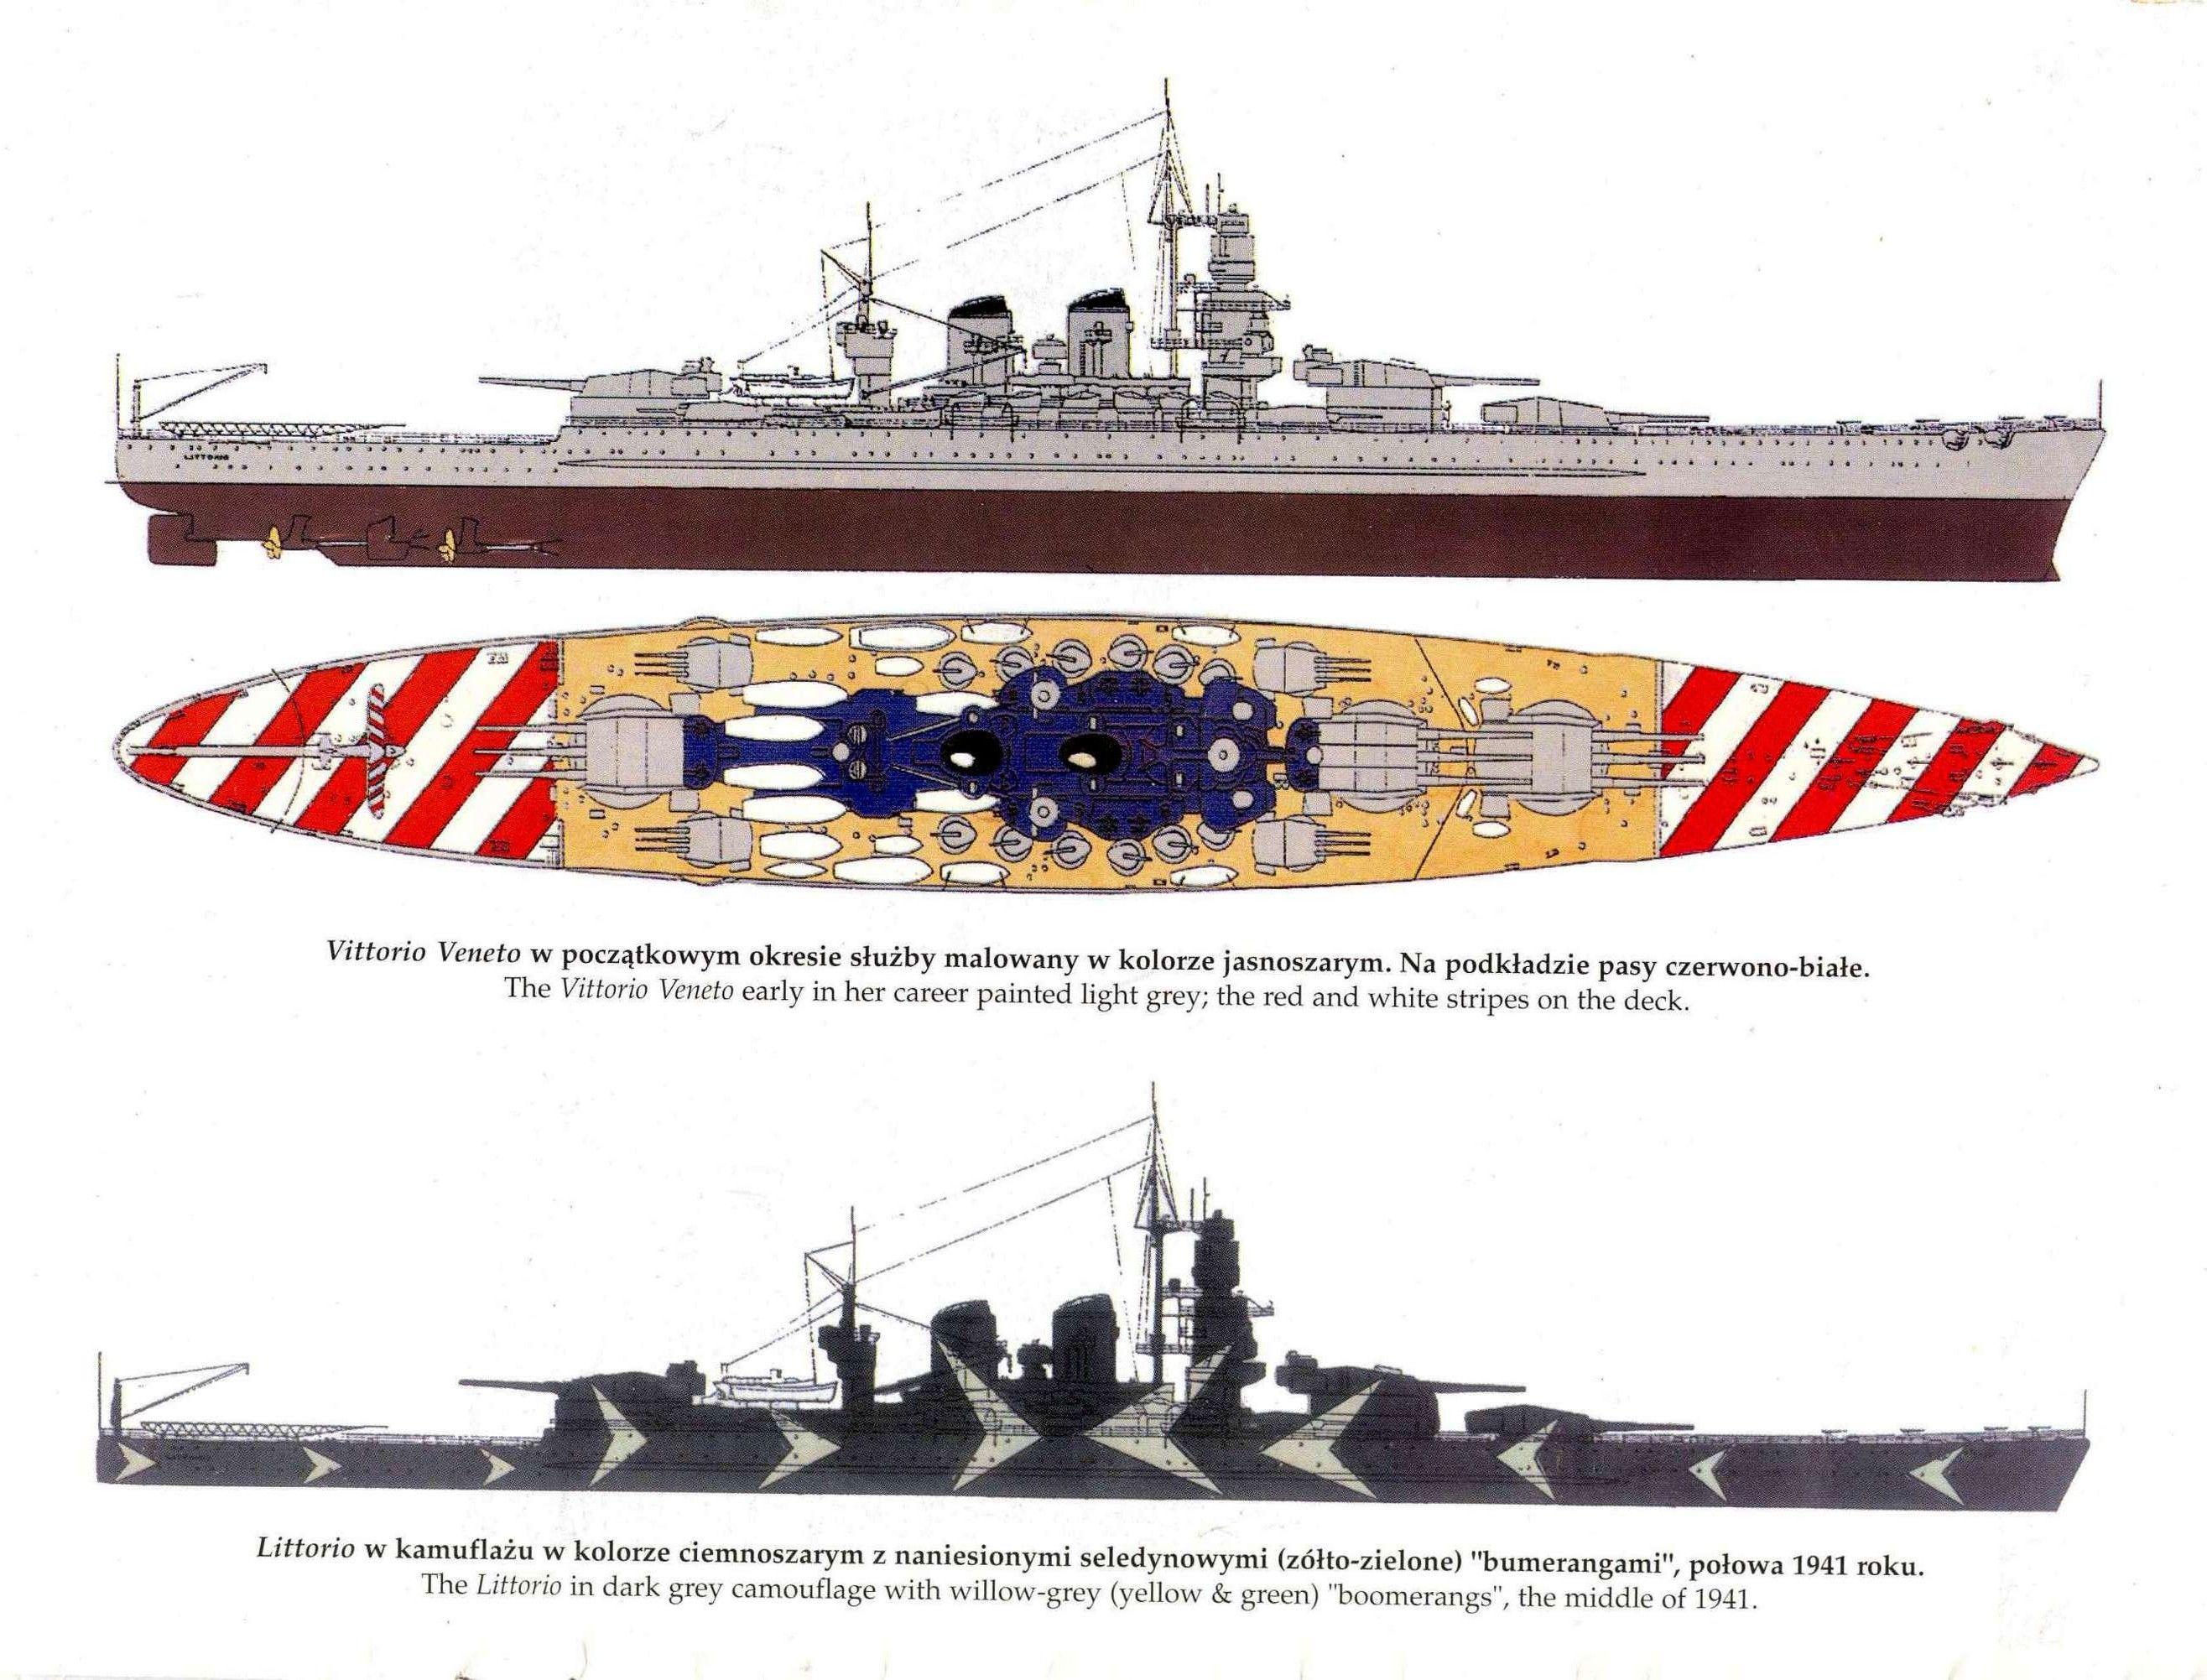 Wwii italy navy battleship roma 1943 plastic model images list - Italian Battleship Vittorio Veneto Warships Diagram 182 Pinterest Battleship Wwi And Navy Ships